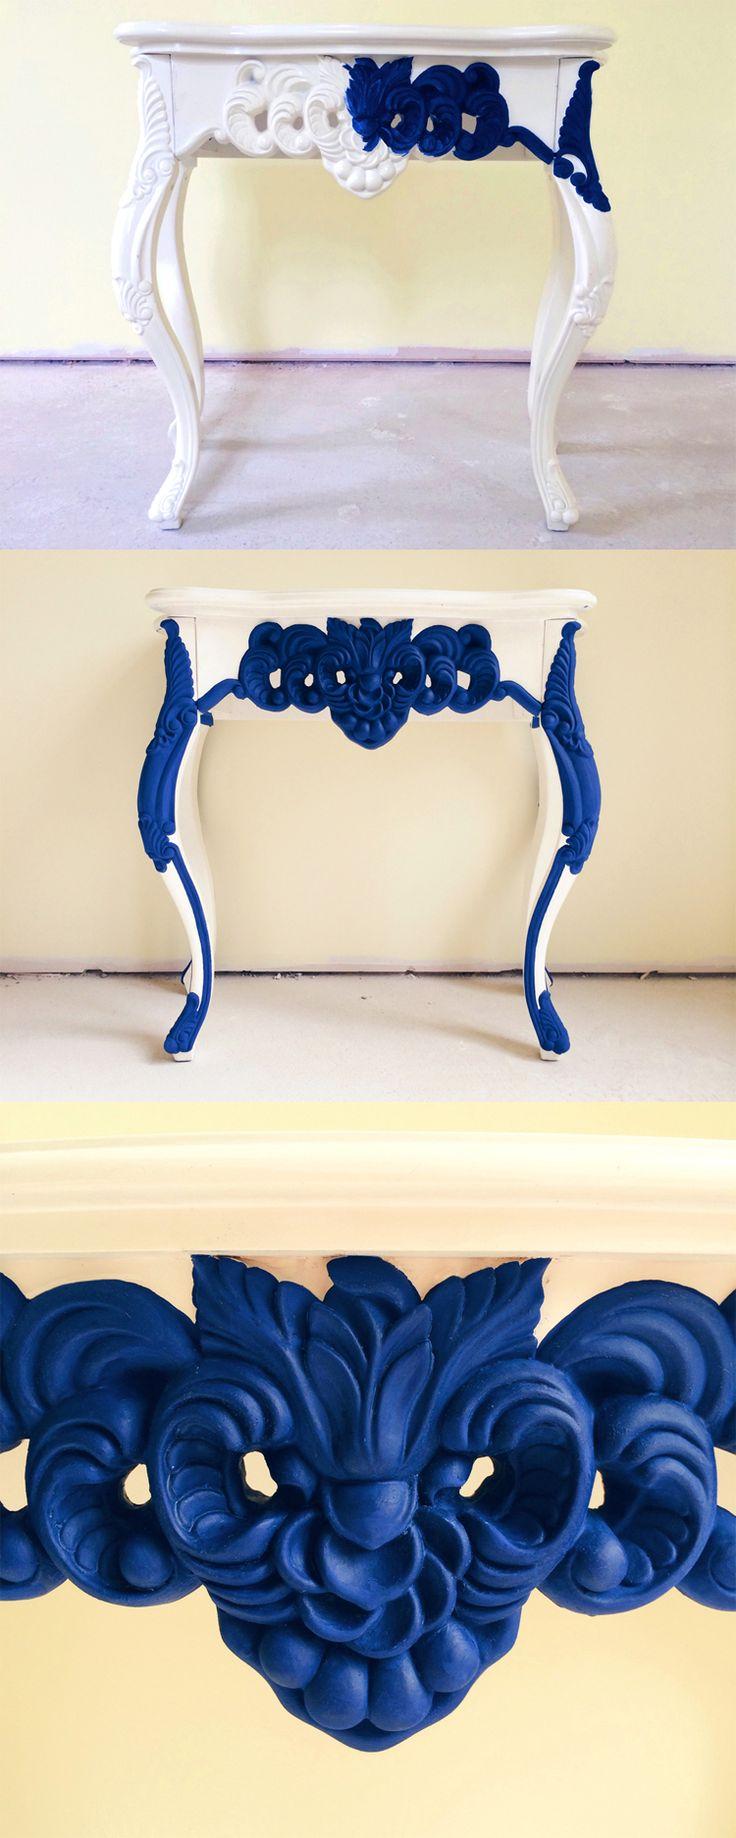 Napoleonic Blue Chalk Paint on White Console #chalkpaint #anniesloan #console #napoleonicblue